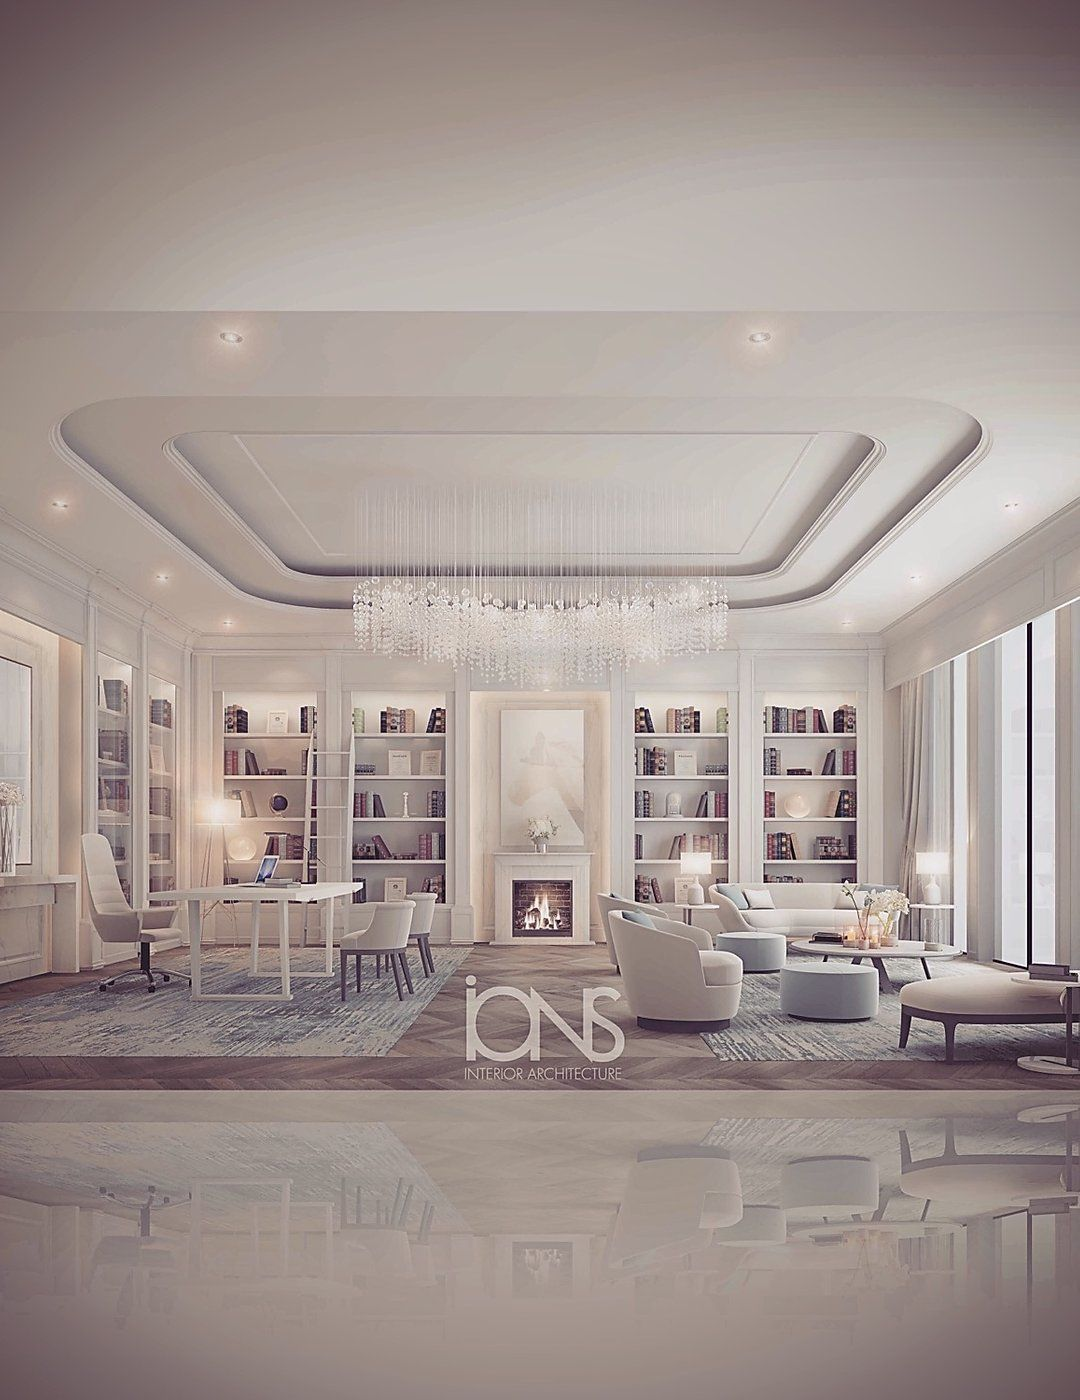 Dubai Interior Design Company Interior Design Ideas For Luxury House Interior Design Companies Bathroom Lighting Design Custom Bathroom Designs